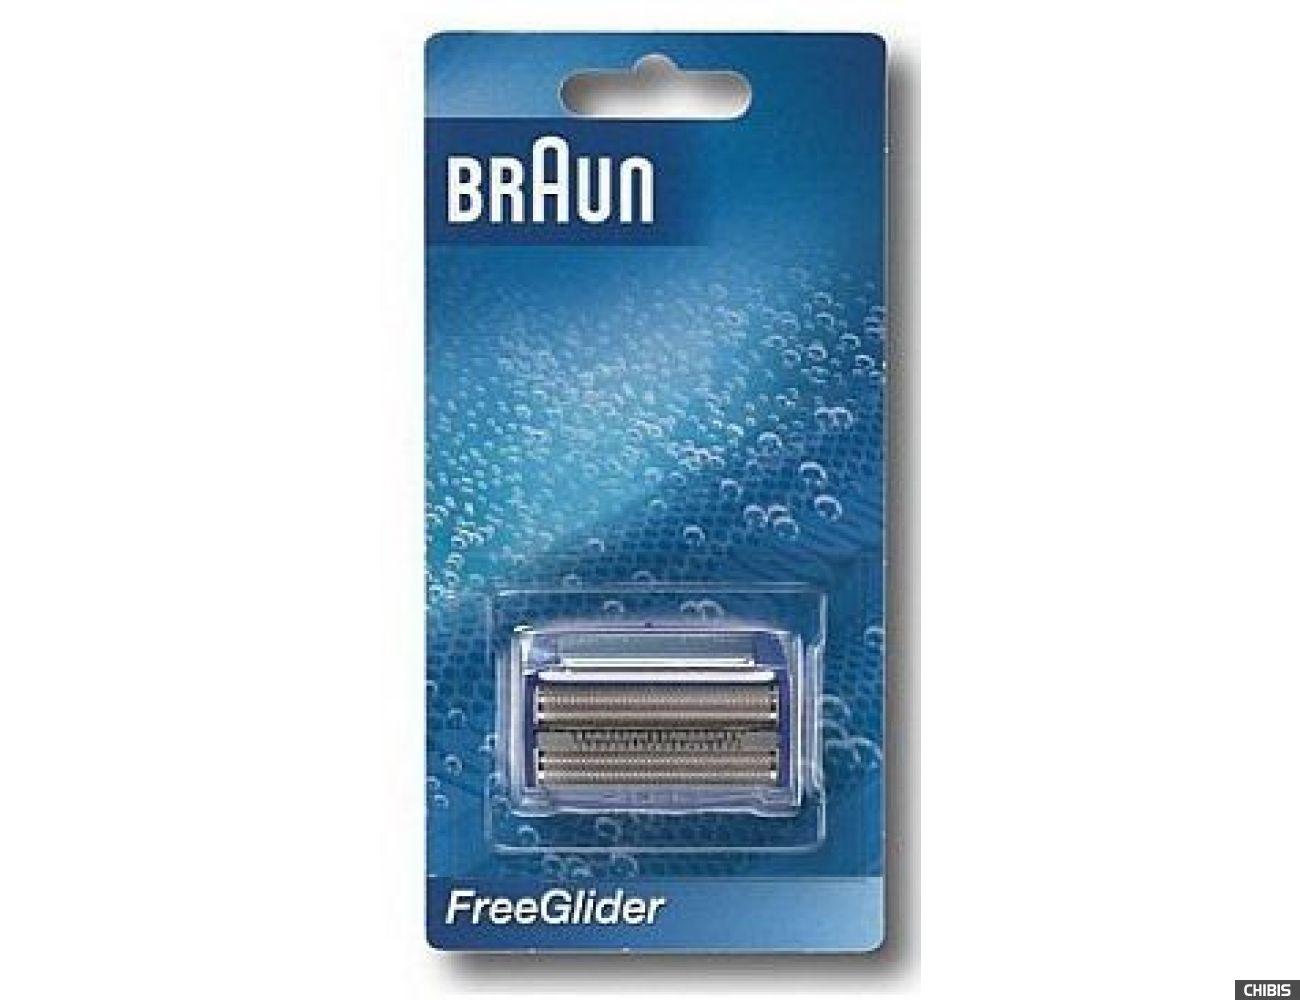 Сетка Braun 6600 FreeGlider (5710760) 4210201300304